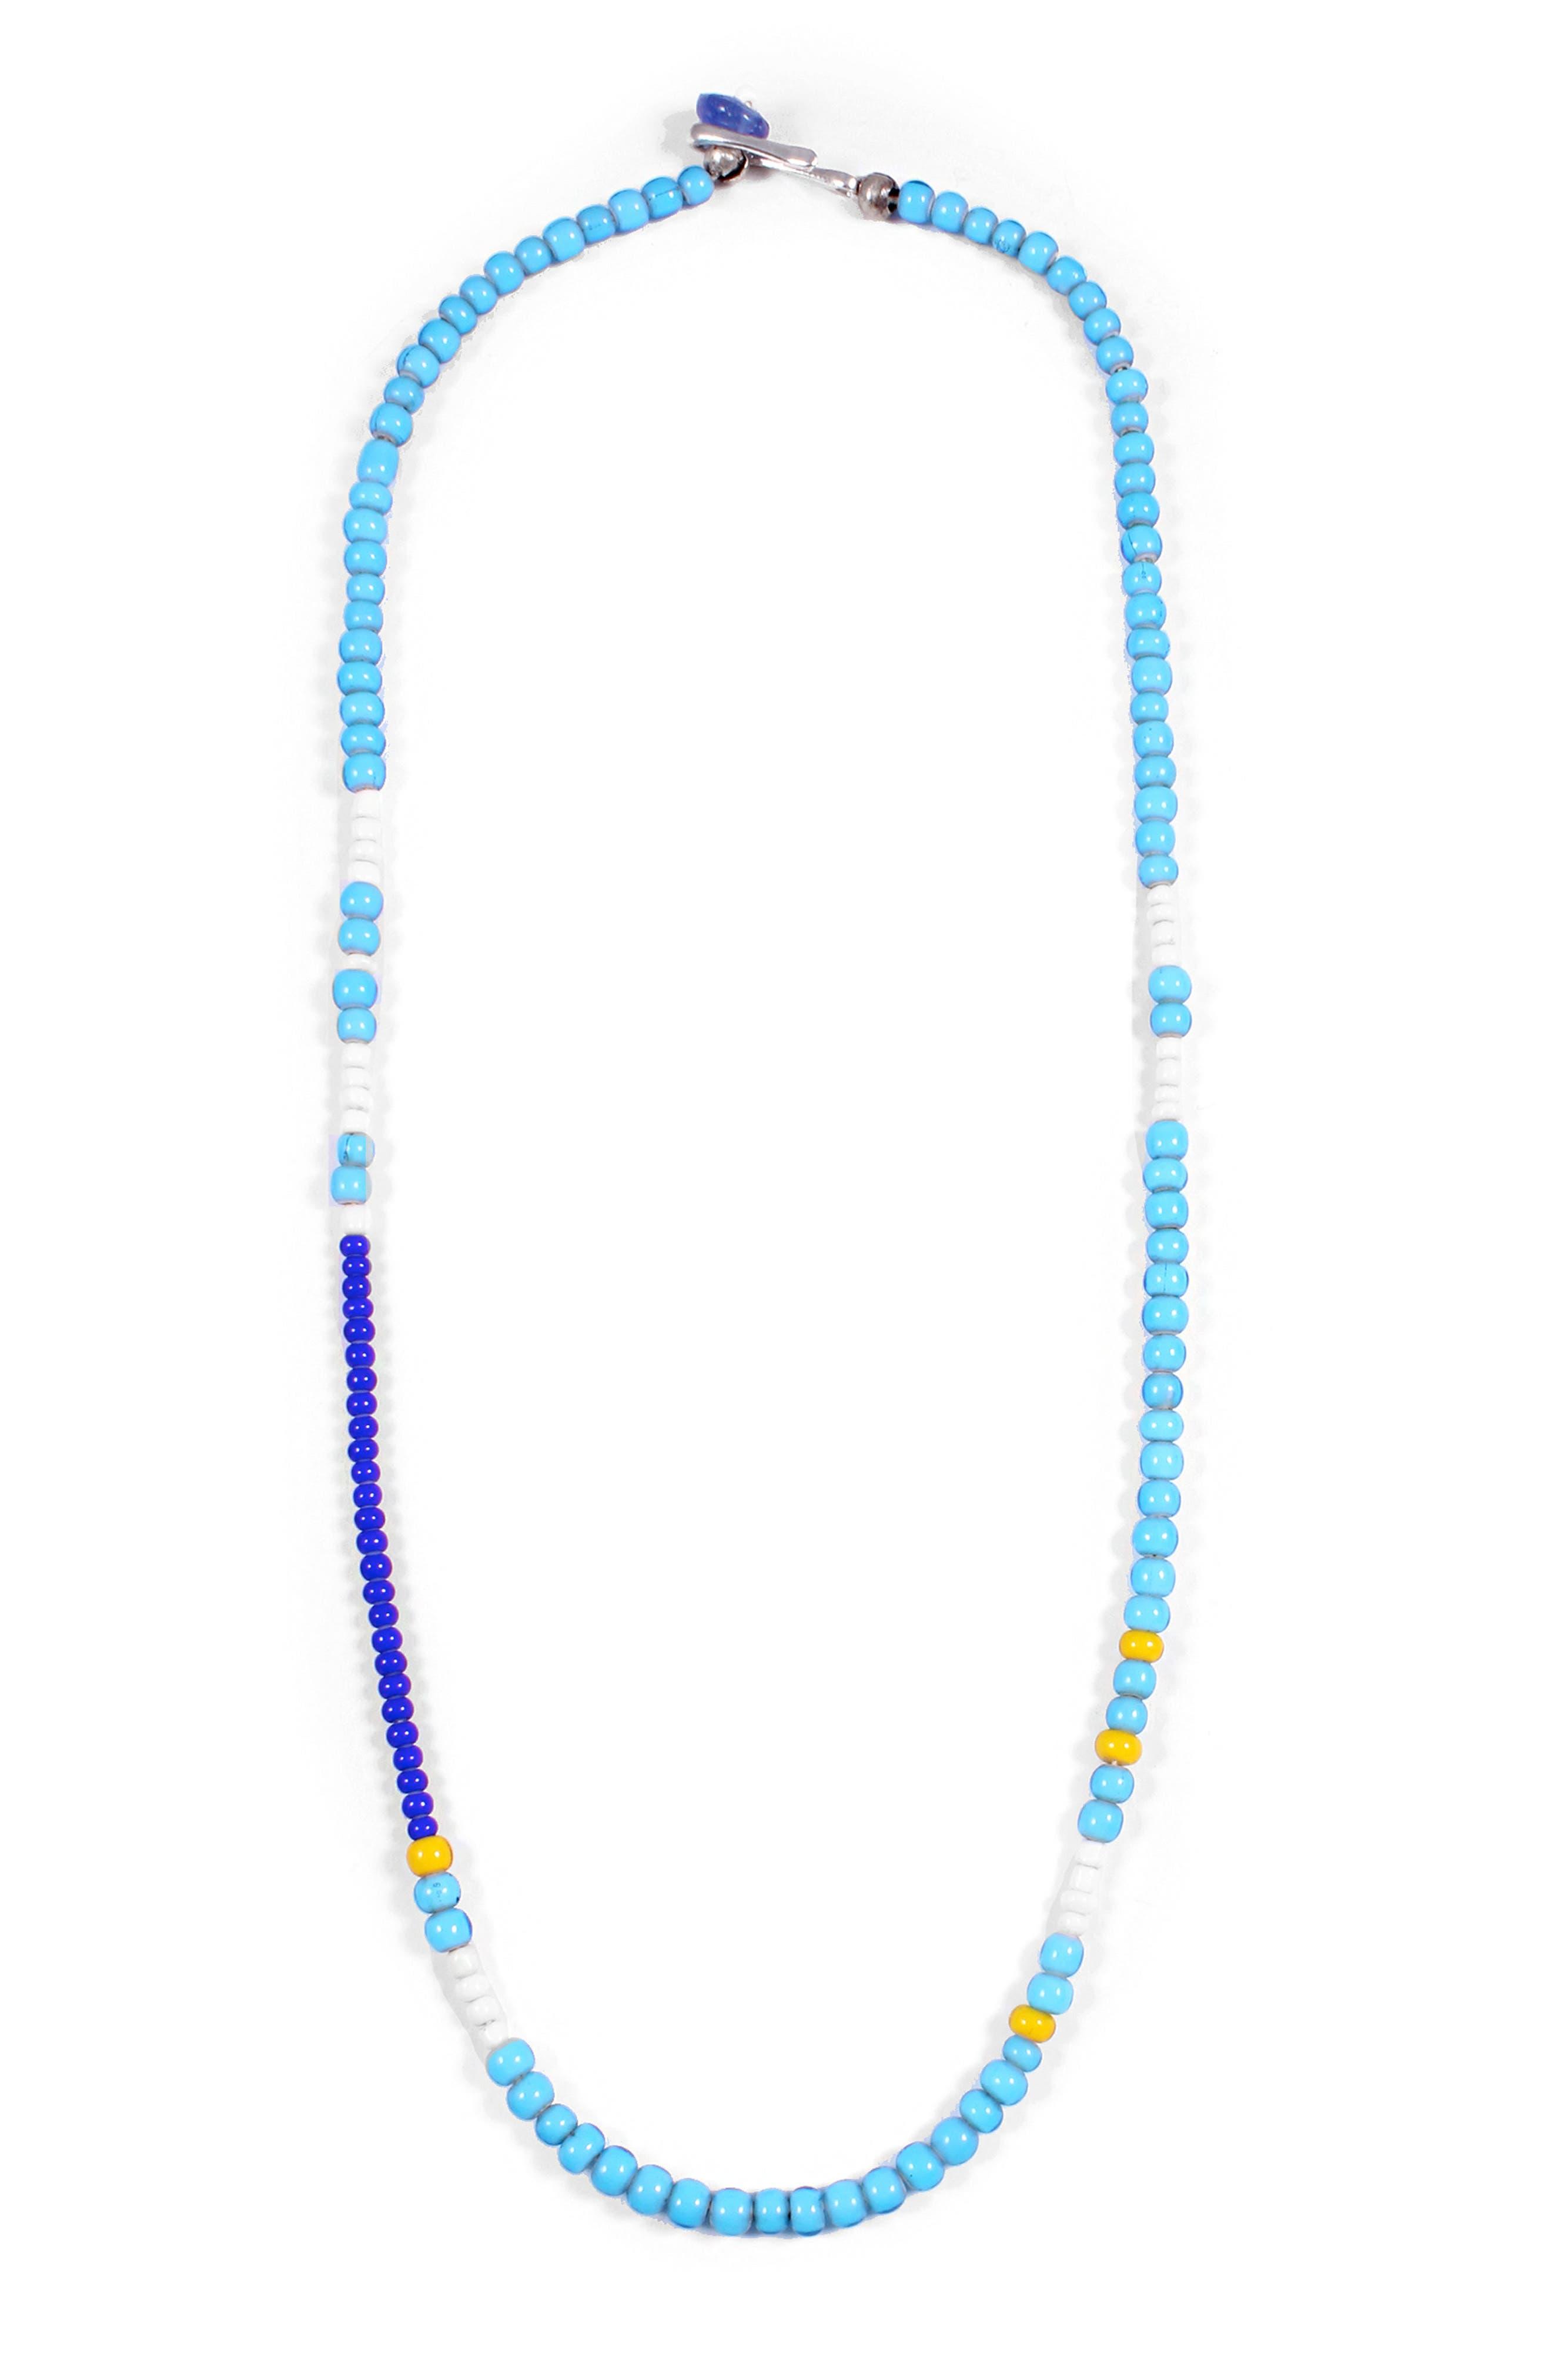 Calm Morse Necklace,                             Main thumbnail 1, color,                             430